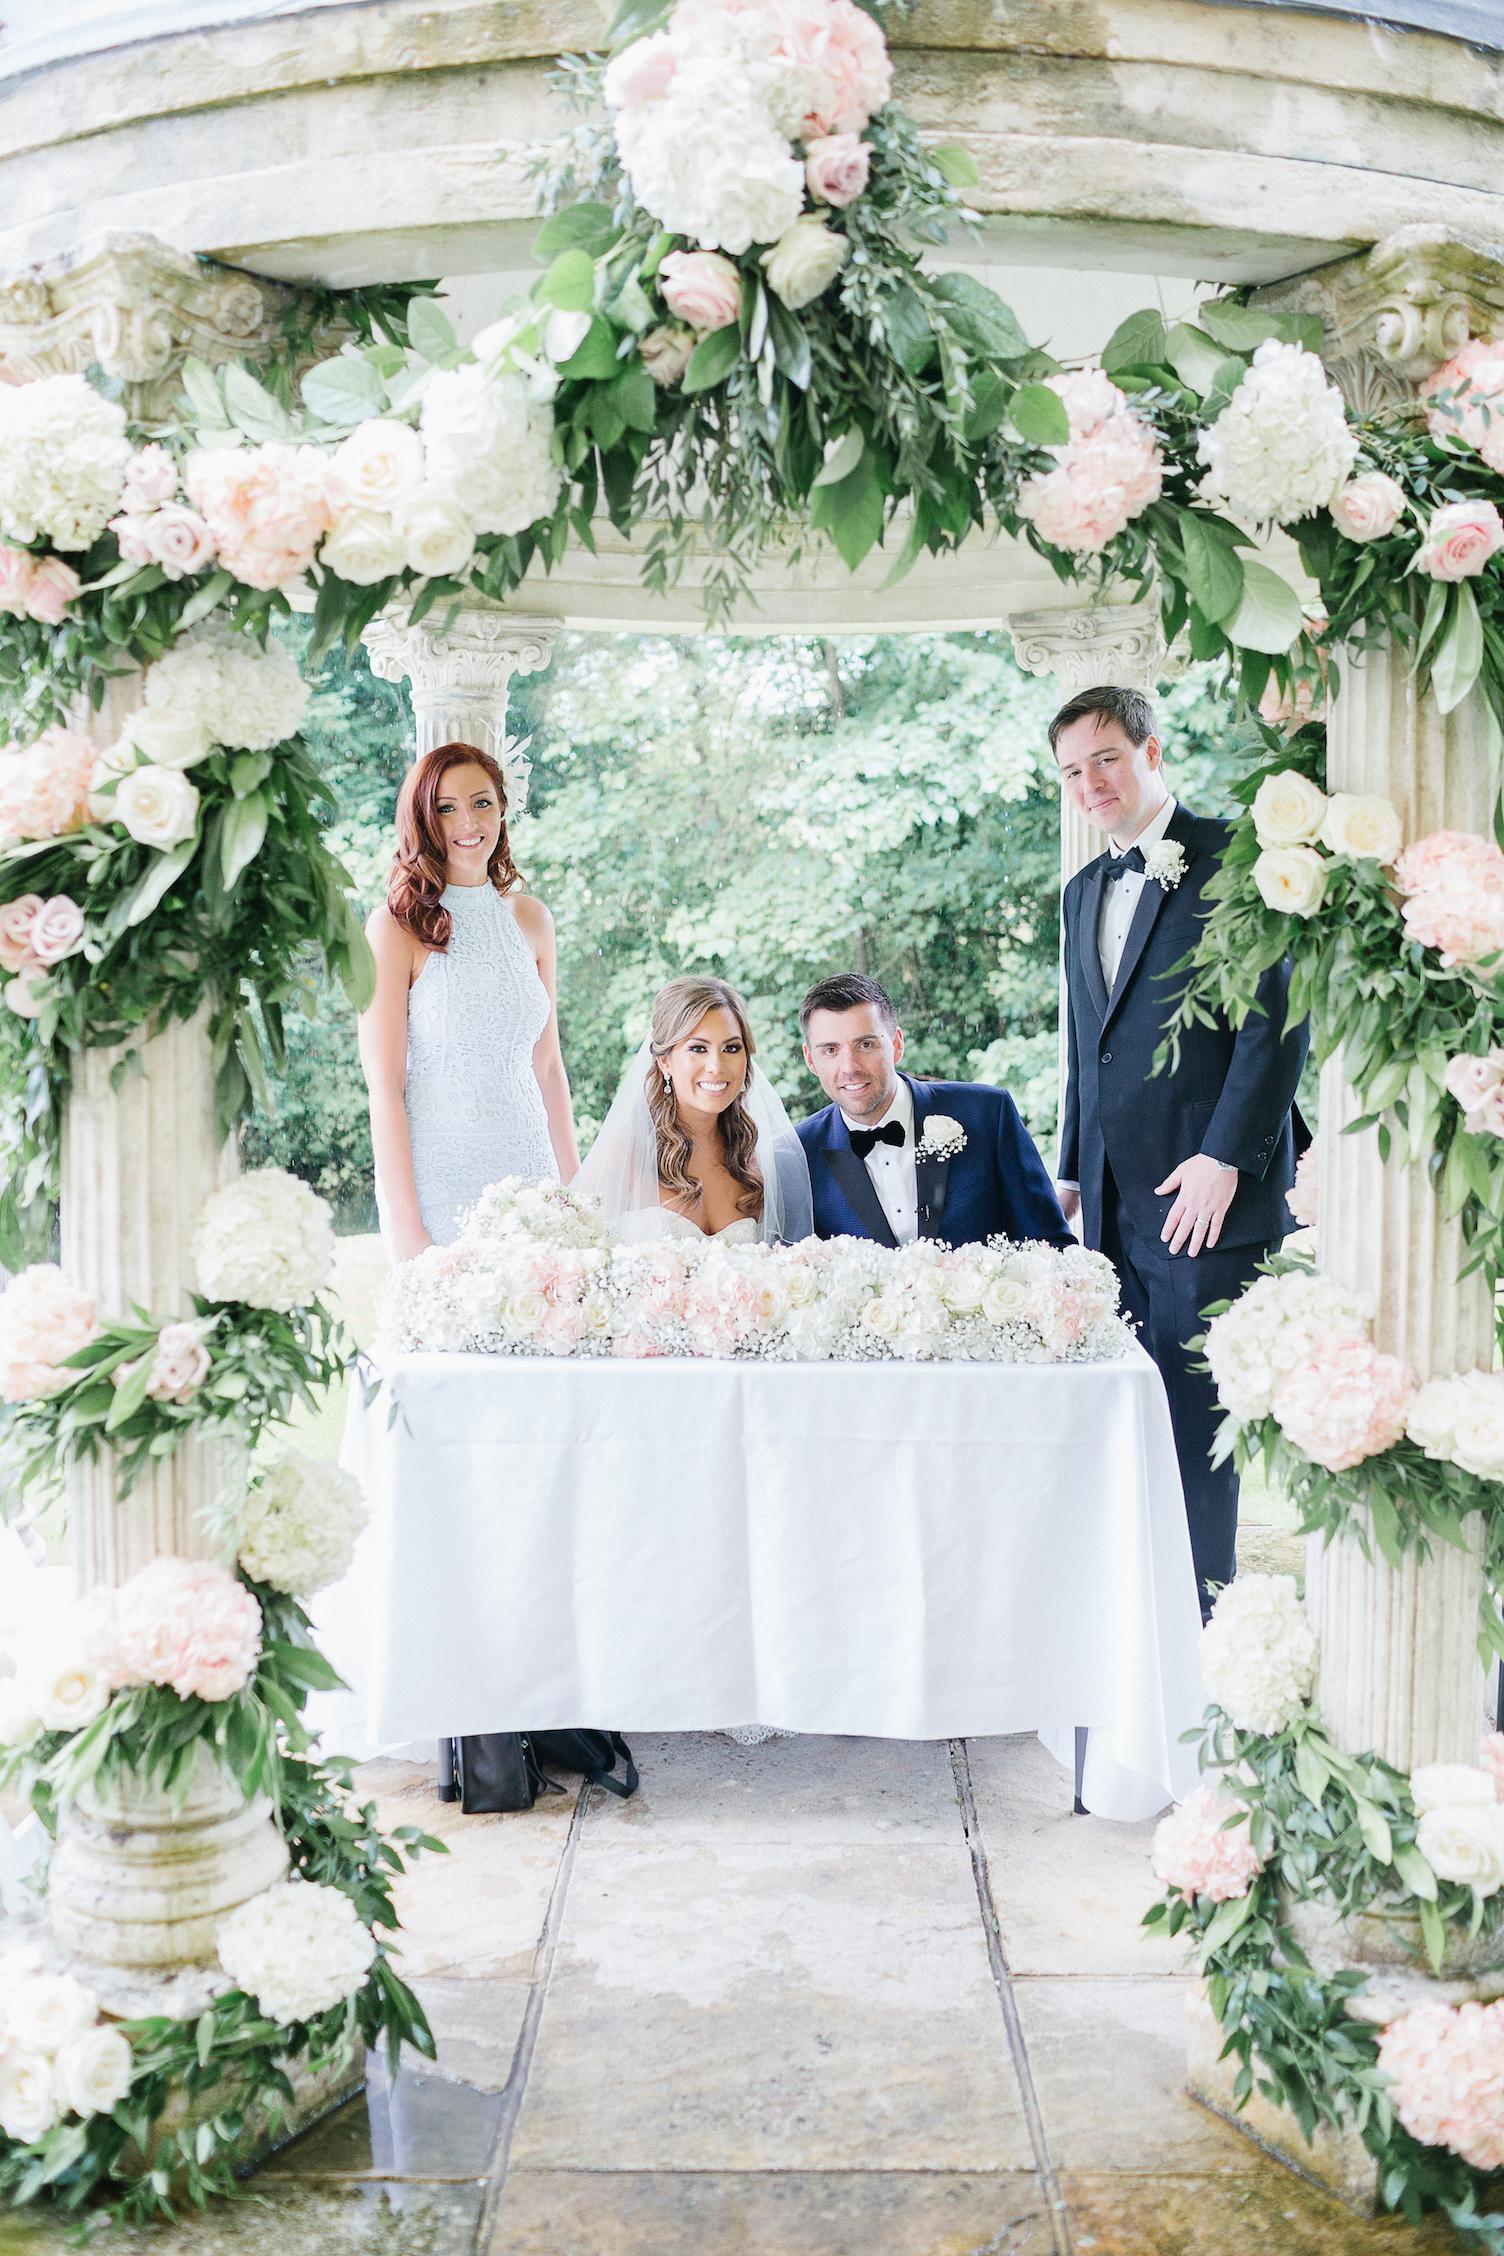 Ardington-house-wedding-ilaria-petrucci-photography-sophie-and-david-439 copy